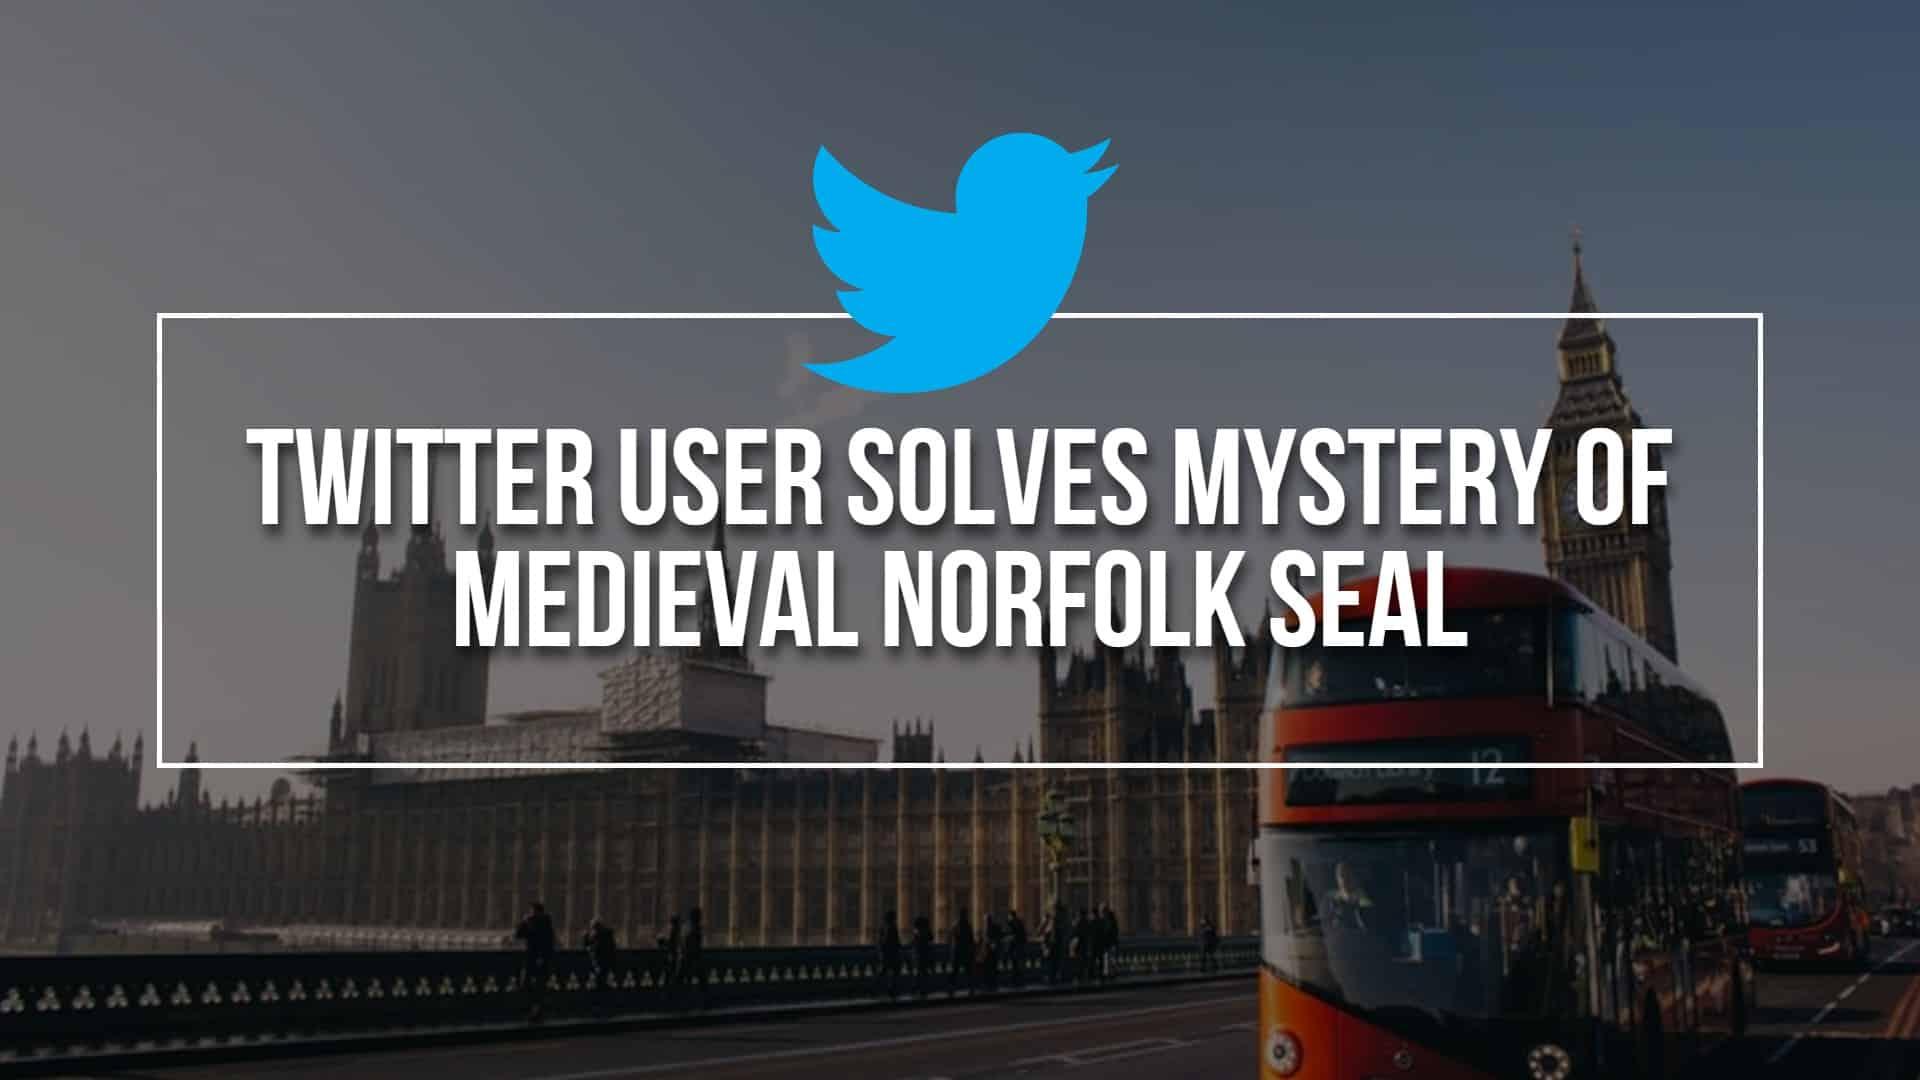 Twitter User Solves Mystery Of Medieval Norfolk Seal